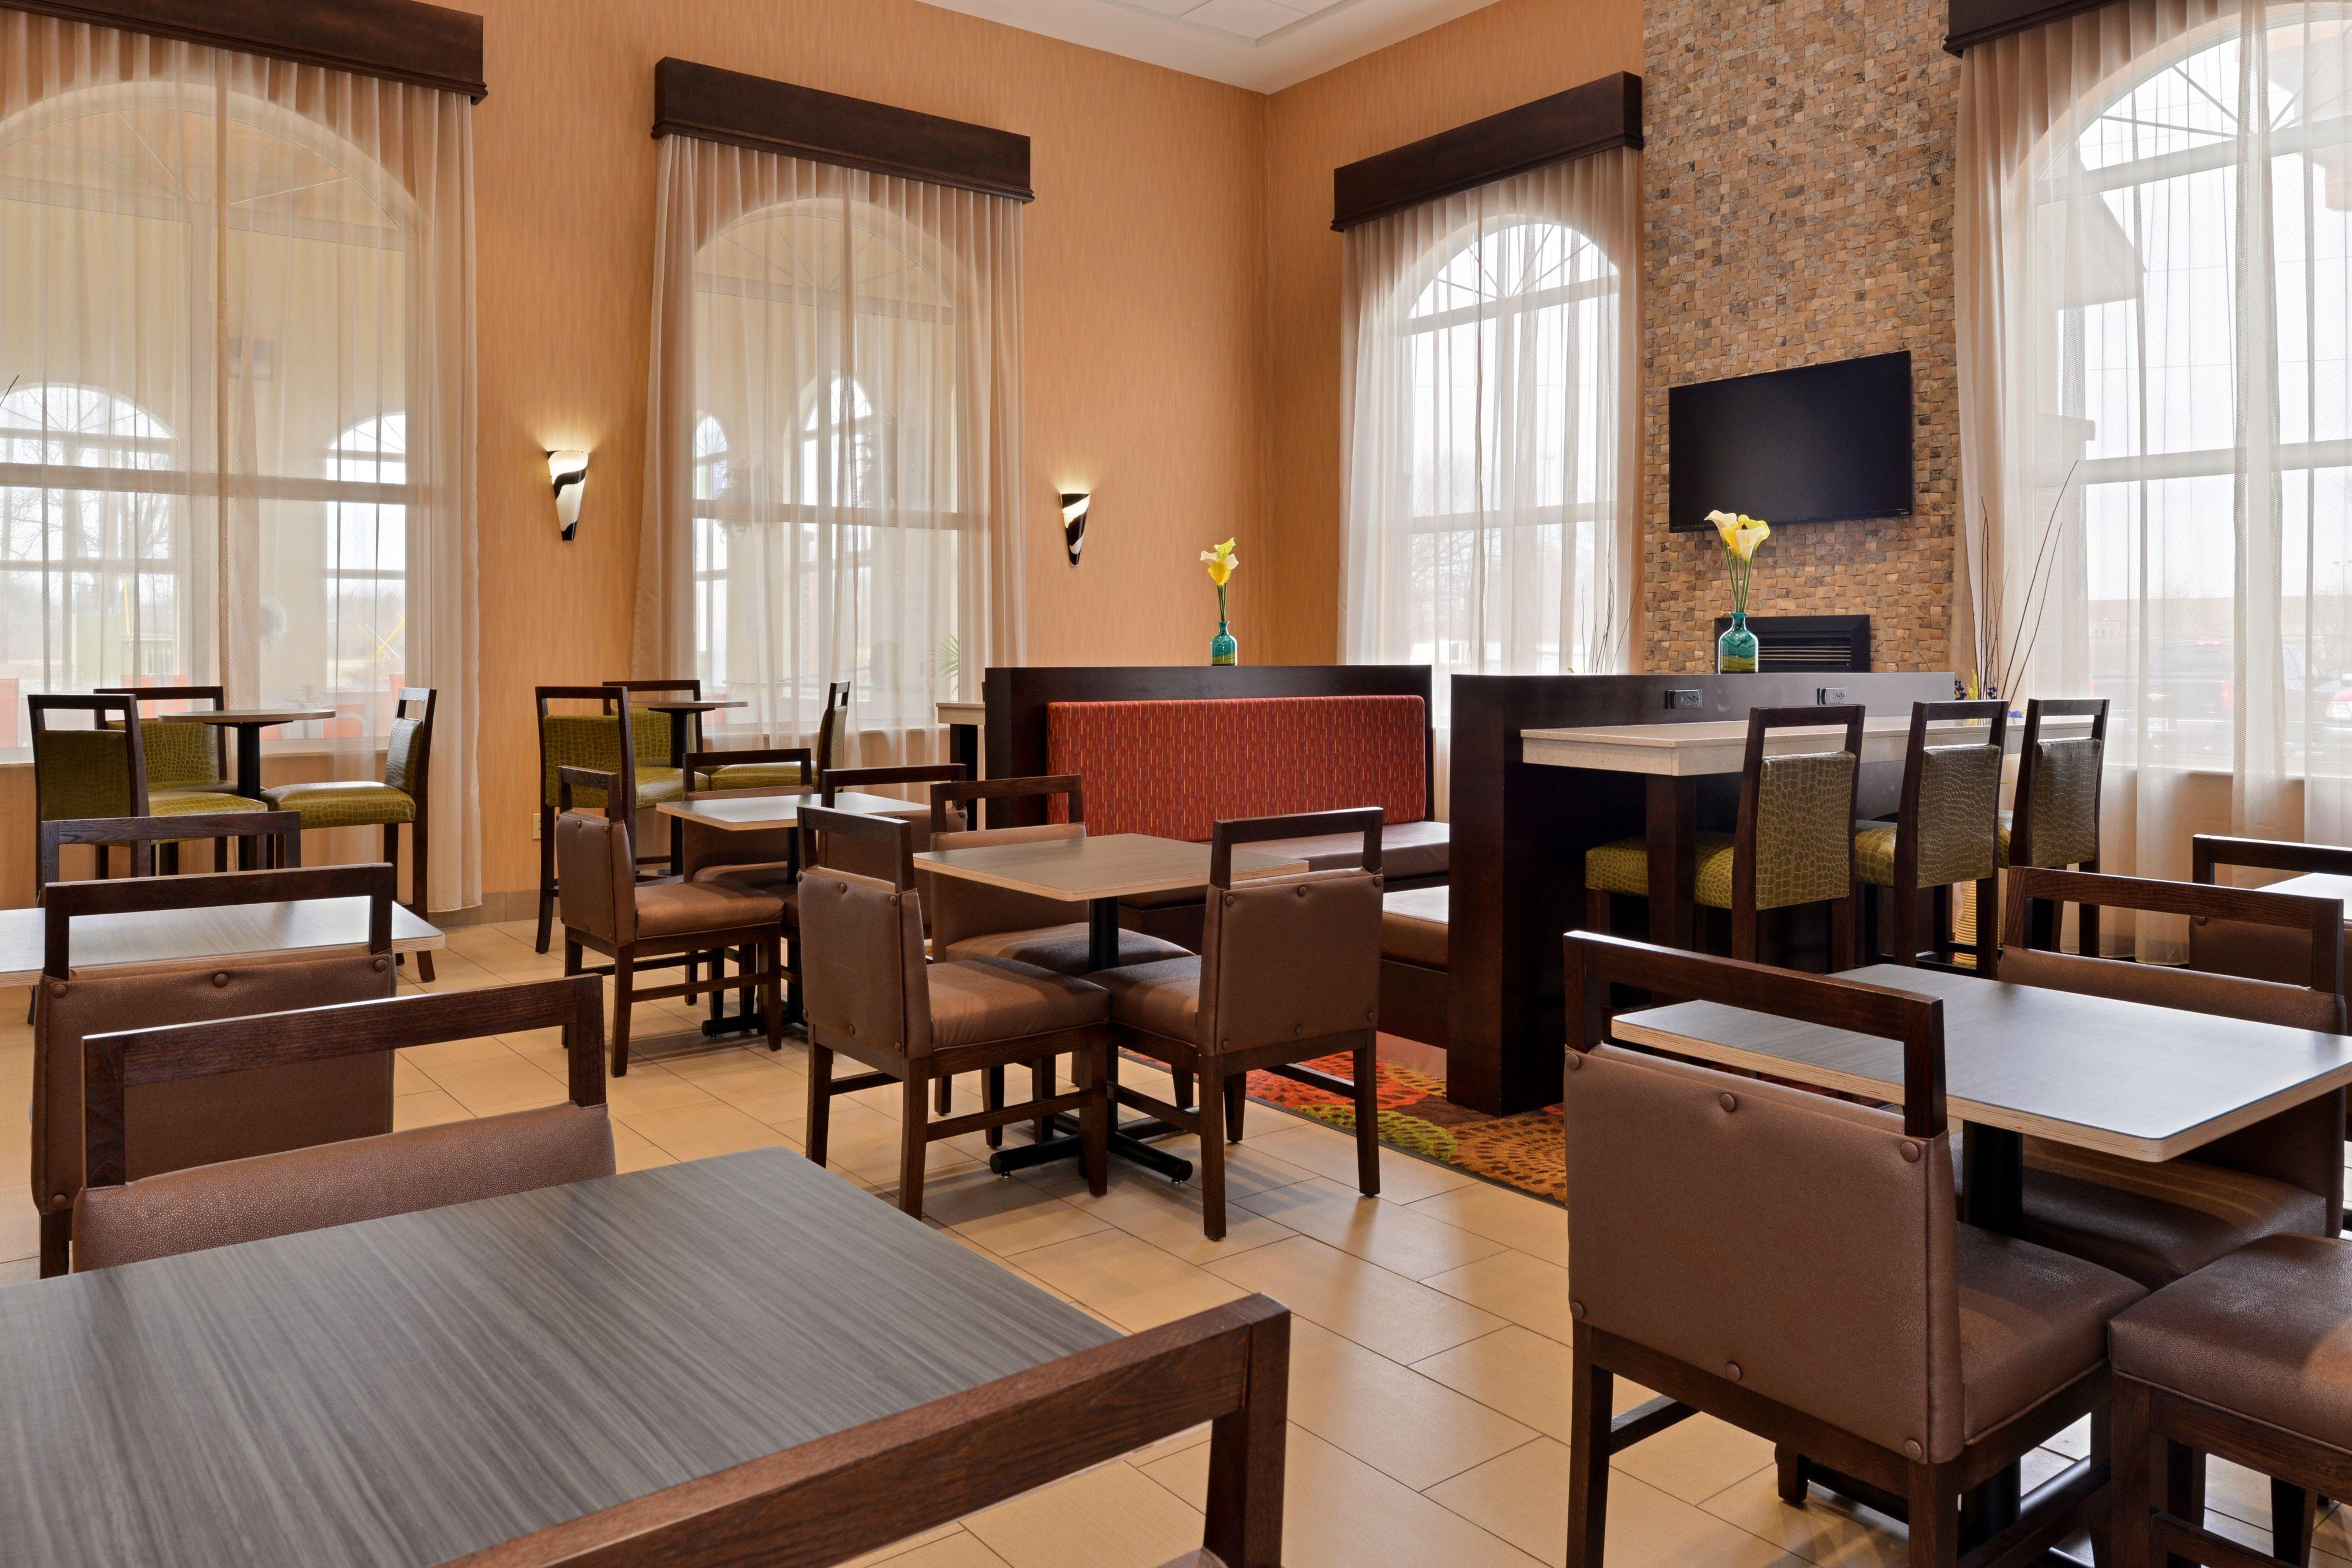 Holiday Inn Express Cincinnati-N/Sharonville image 4